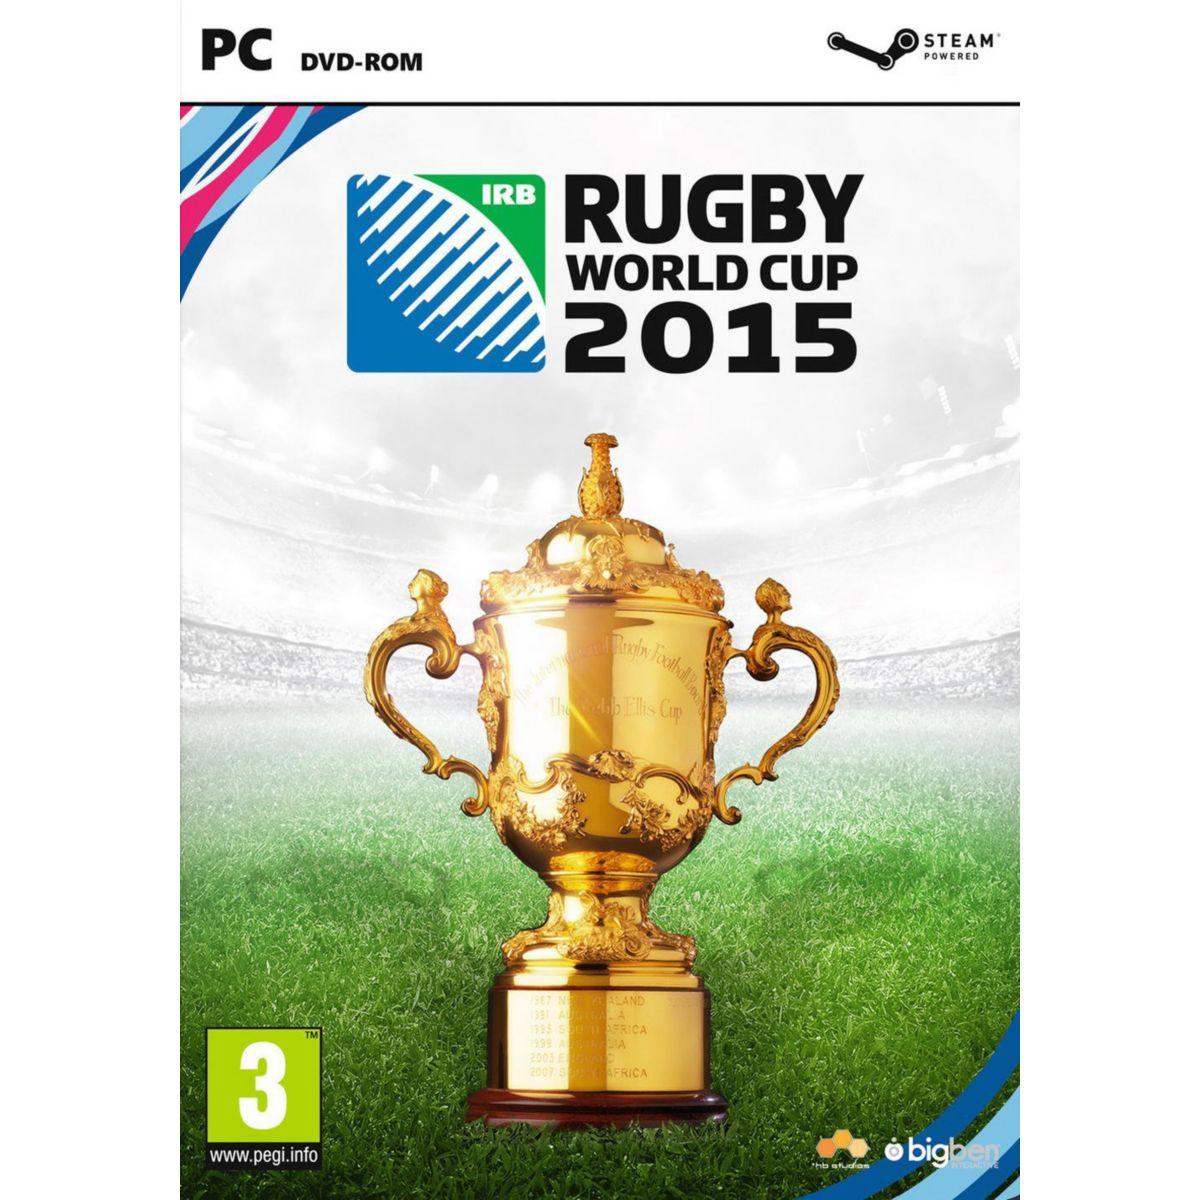 Jeu pc bigben rugby world cup 2015 - soldes et bons plans (photo)